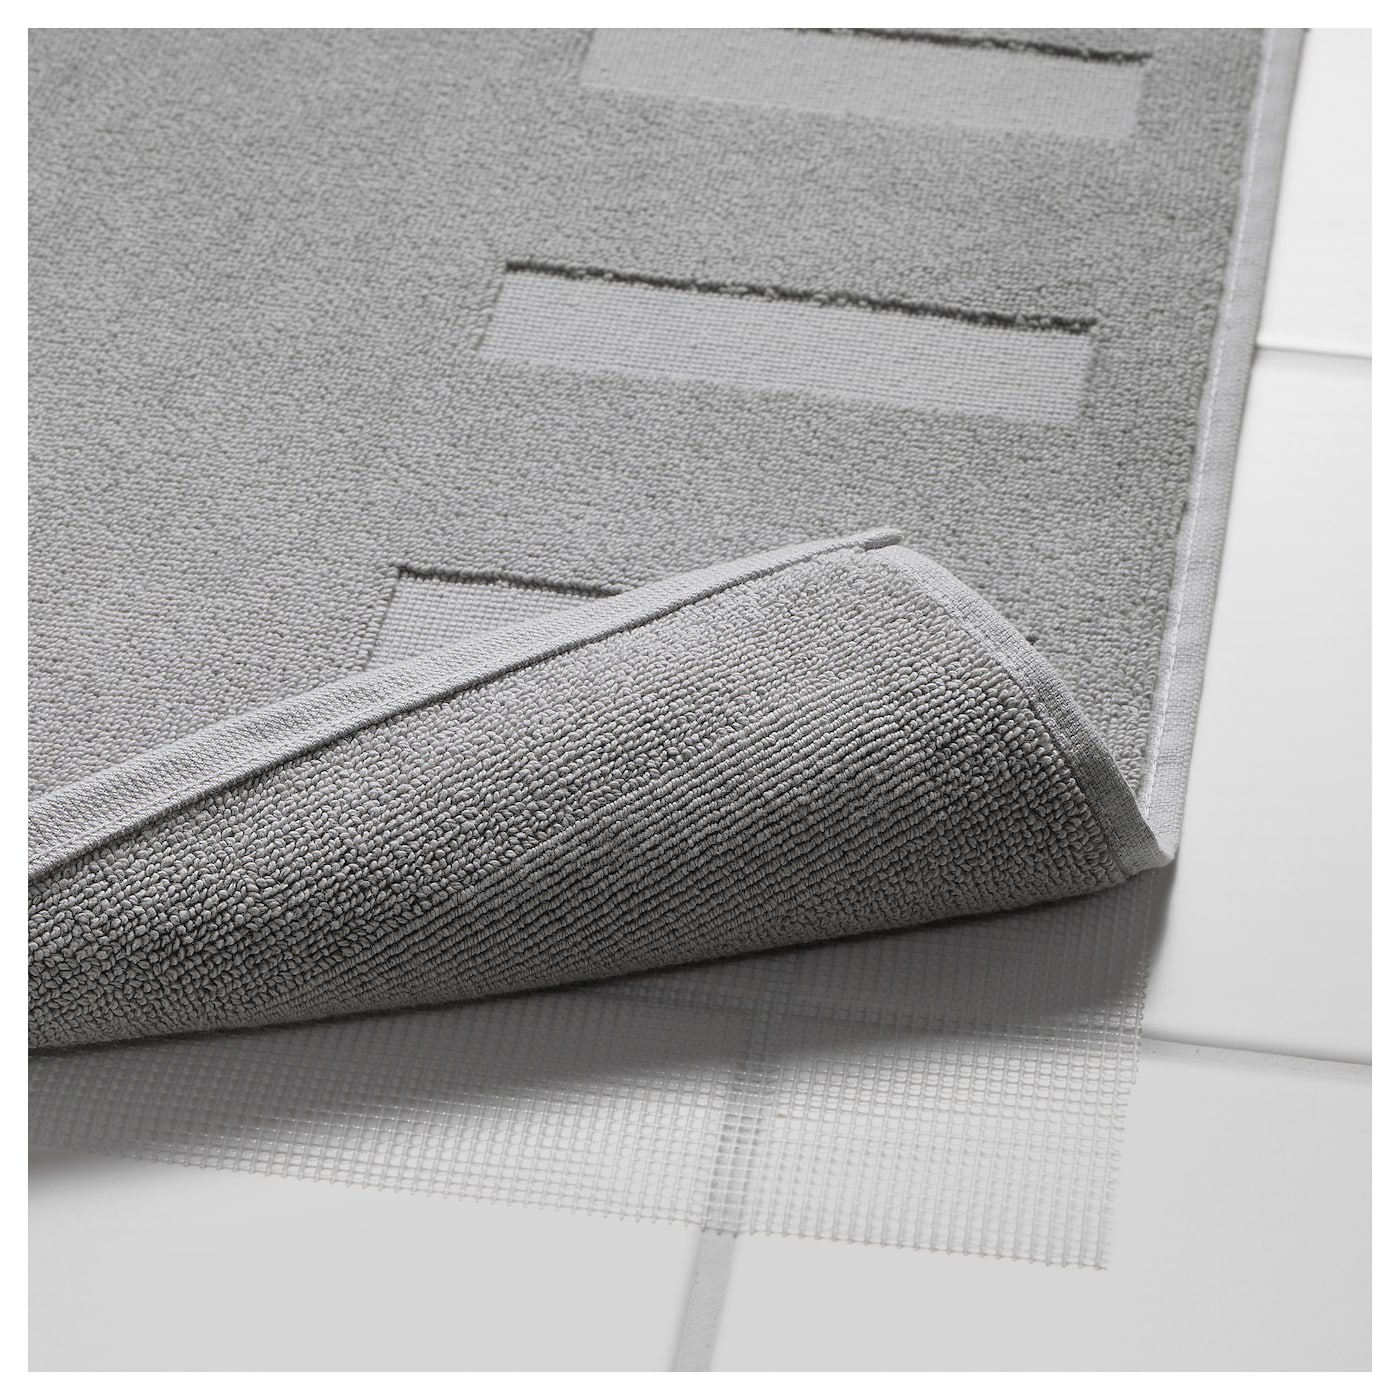 blanksj n tapis de bain gris moyen 50x80 cm ikea. Black Bedroom Furniture Sets. Home Design Ideas